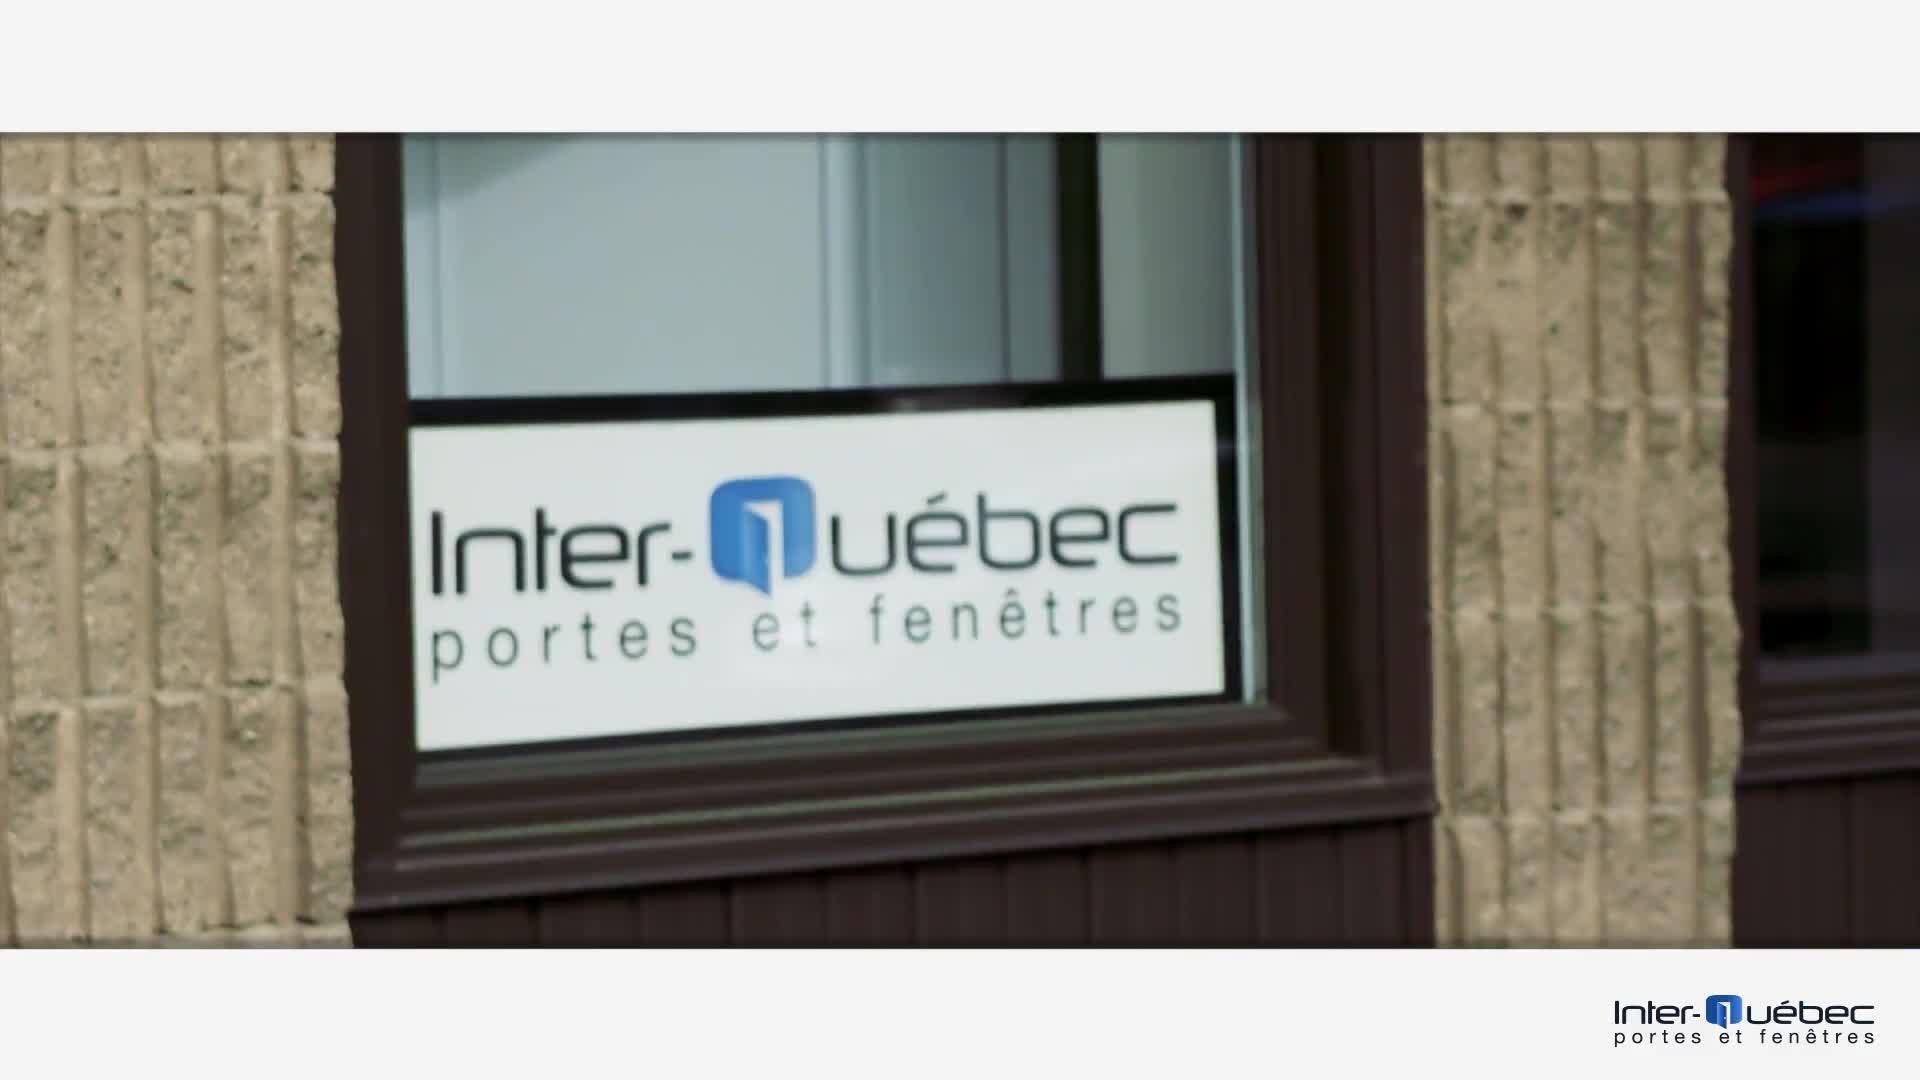 Inter-Québec Portes & Fenêtres - Portes et fenêtres - 514-889-8183